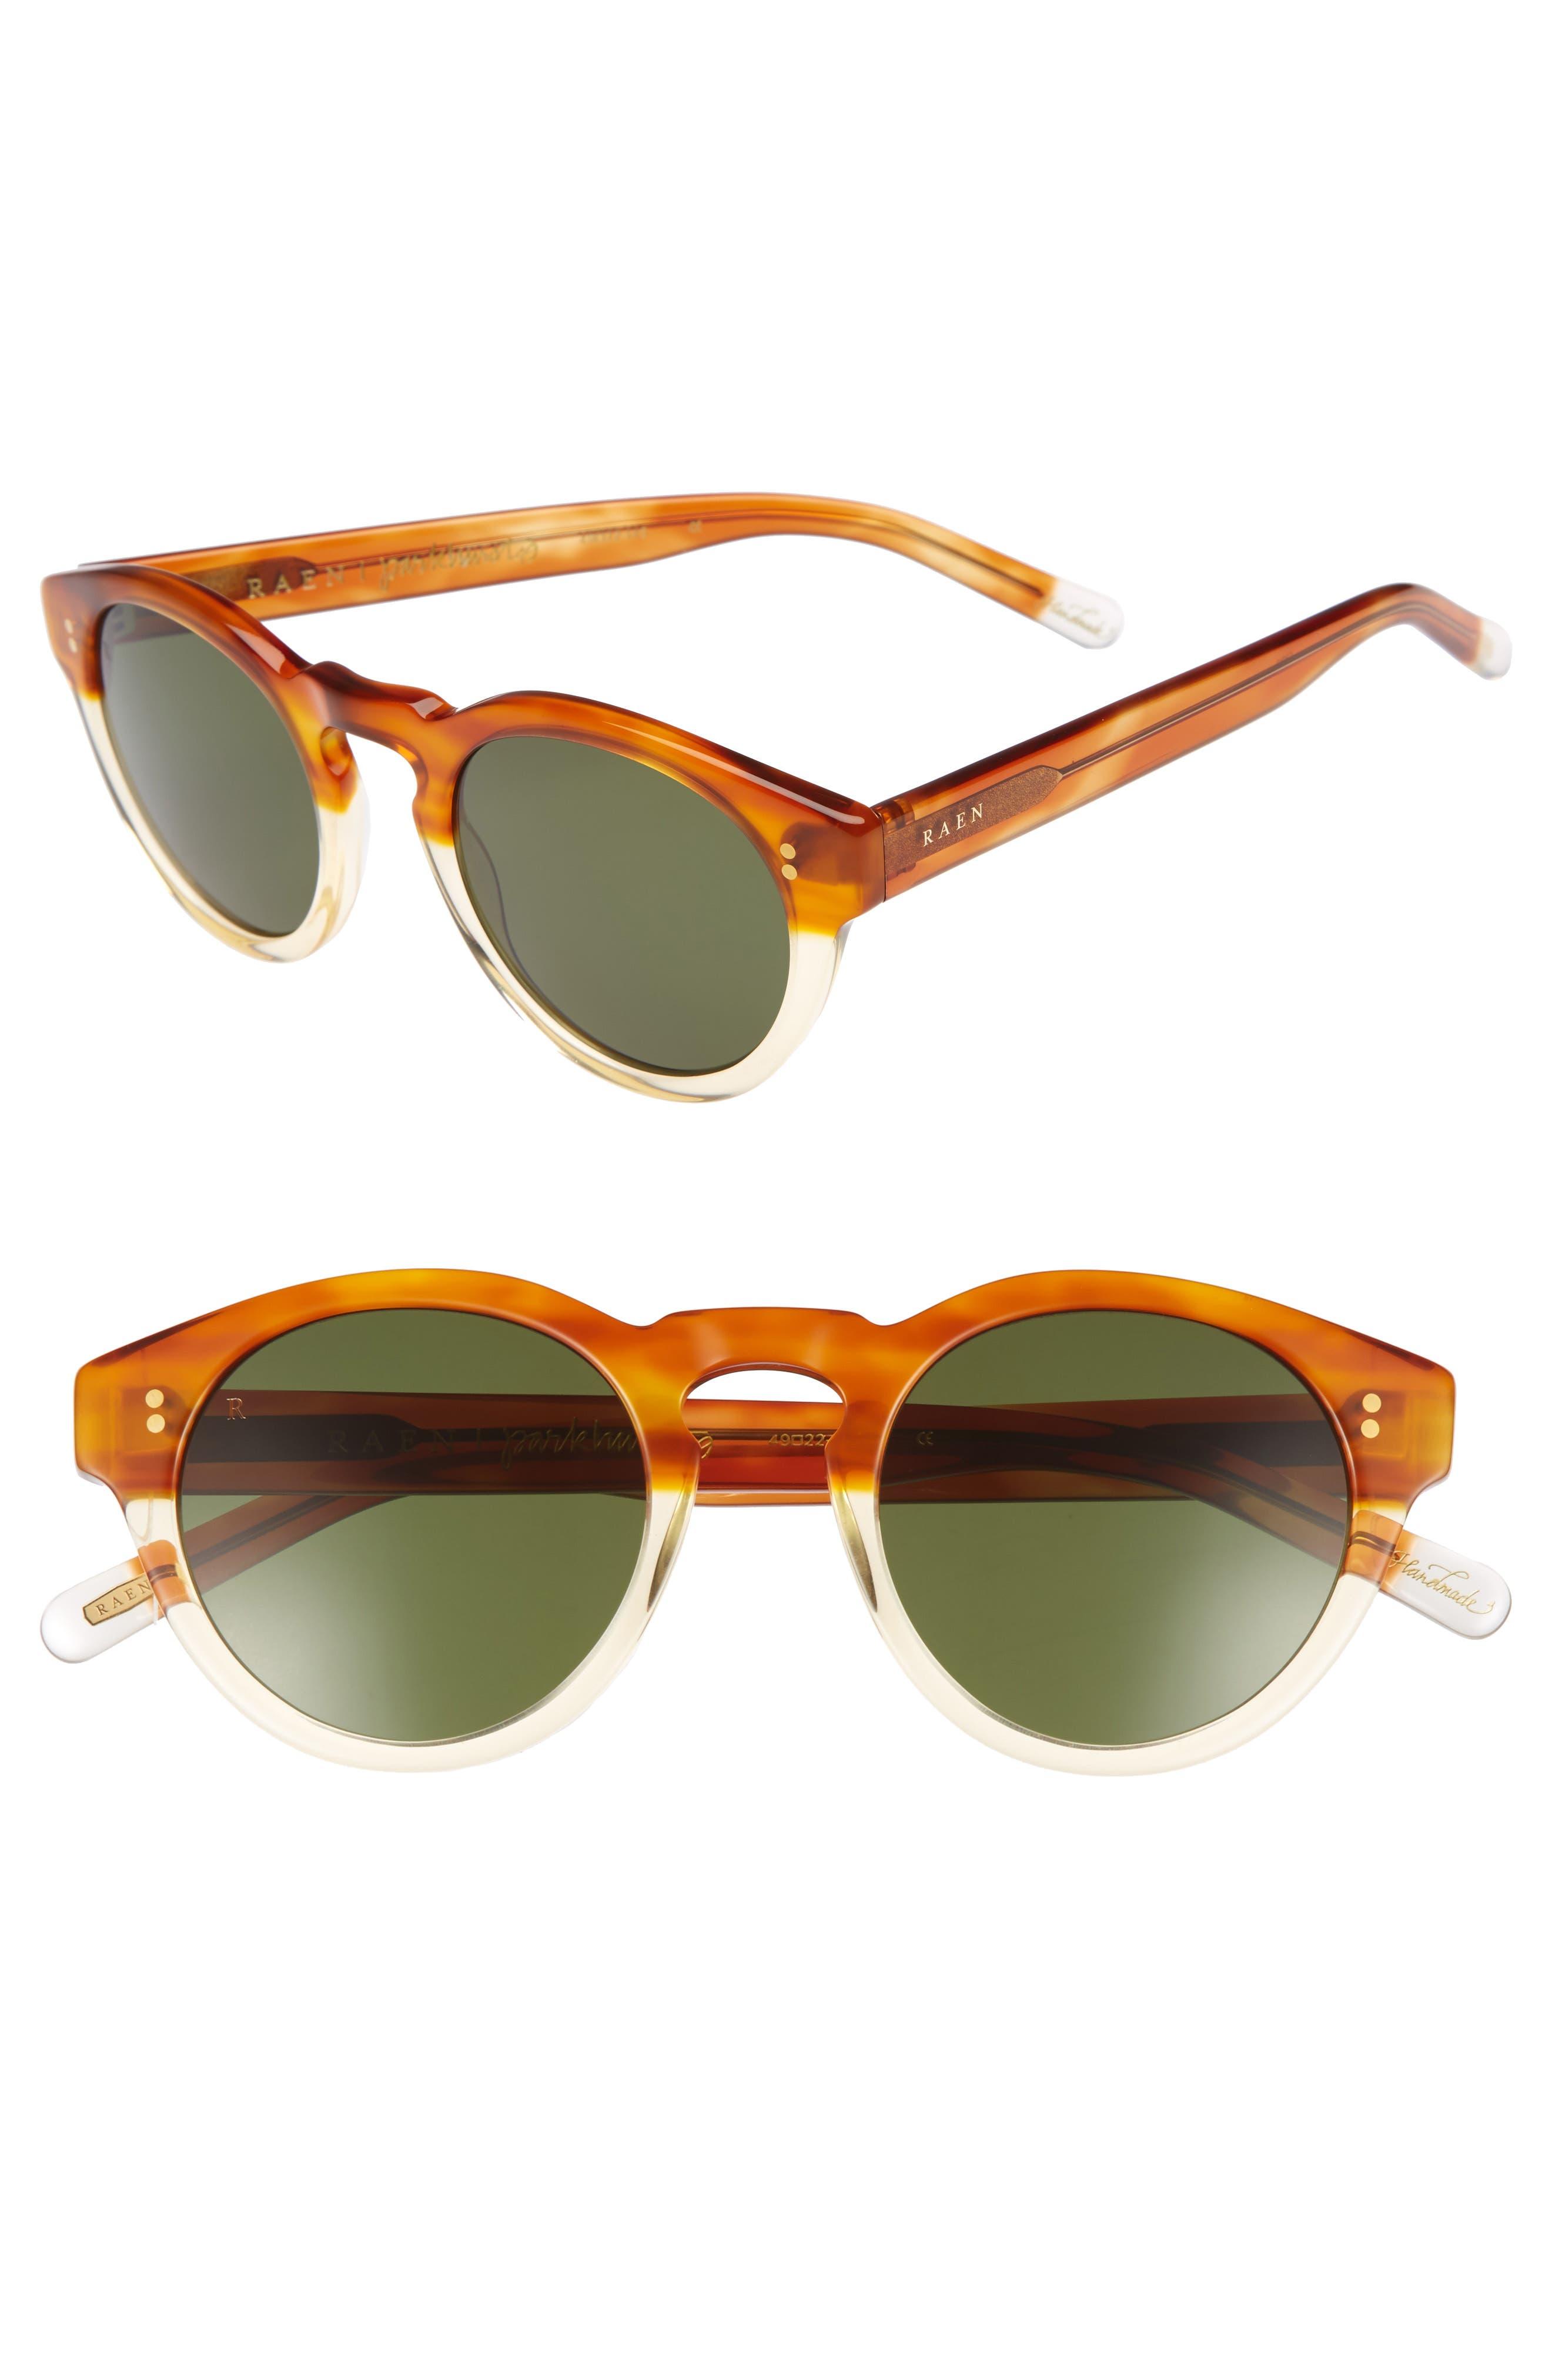 Parkhurst 49mm Sunglasses,                             Main thumbnail 1, color,                             207